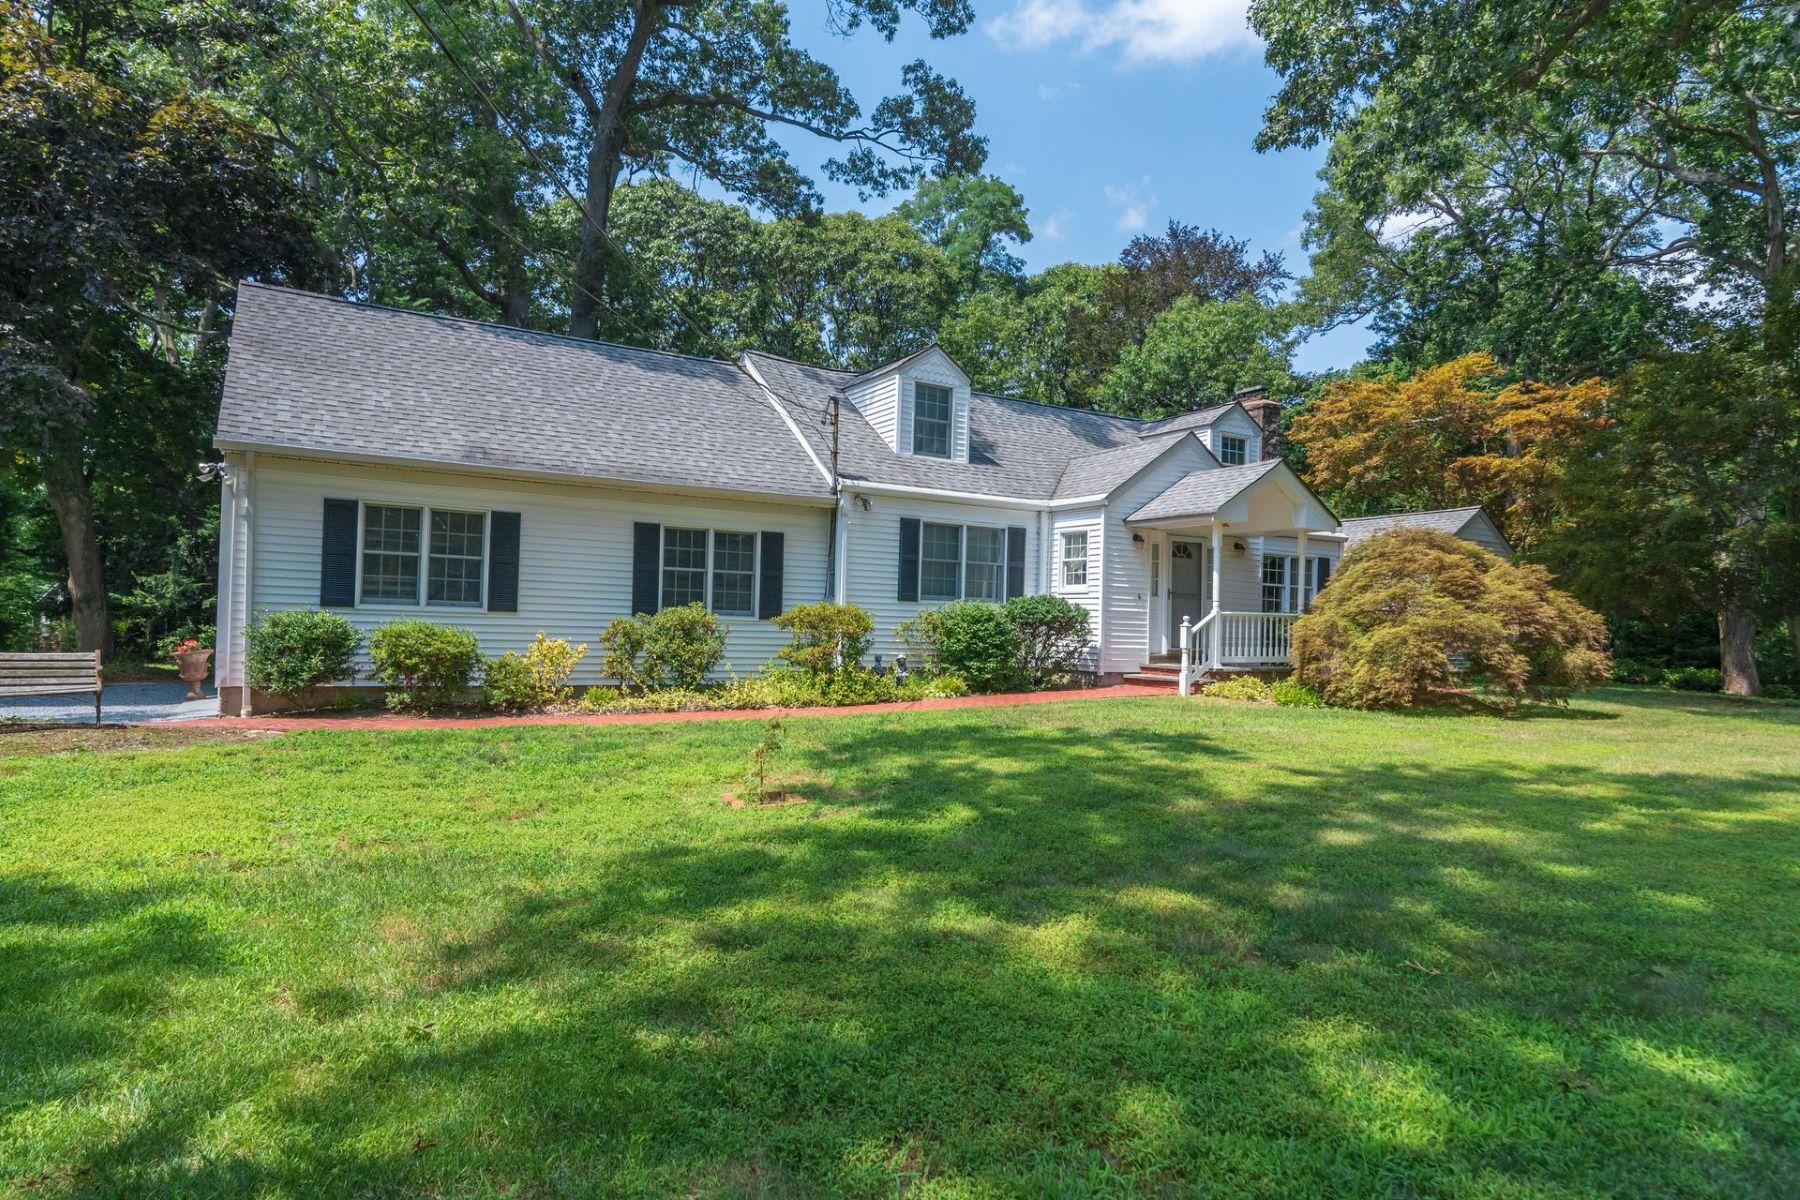 Single Family Homes for Active at Stony Brook 25 Woodbine Ave Stony Brook, New York 11790 United States